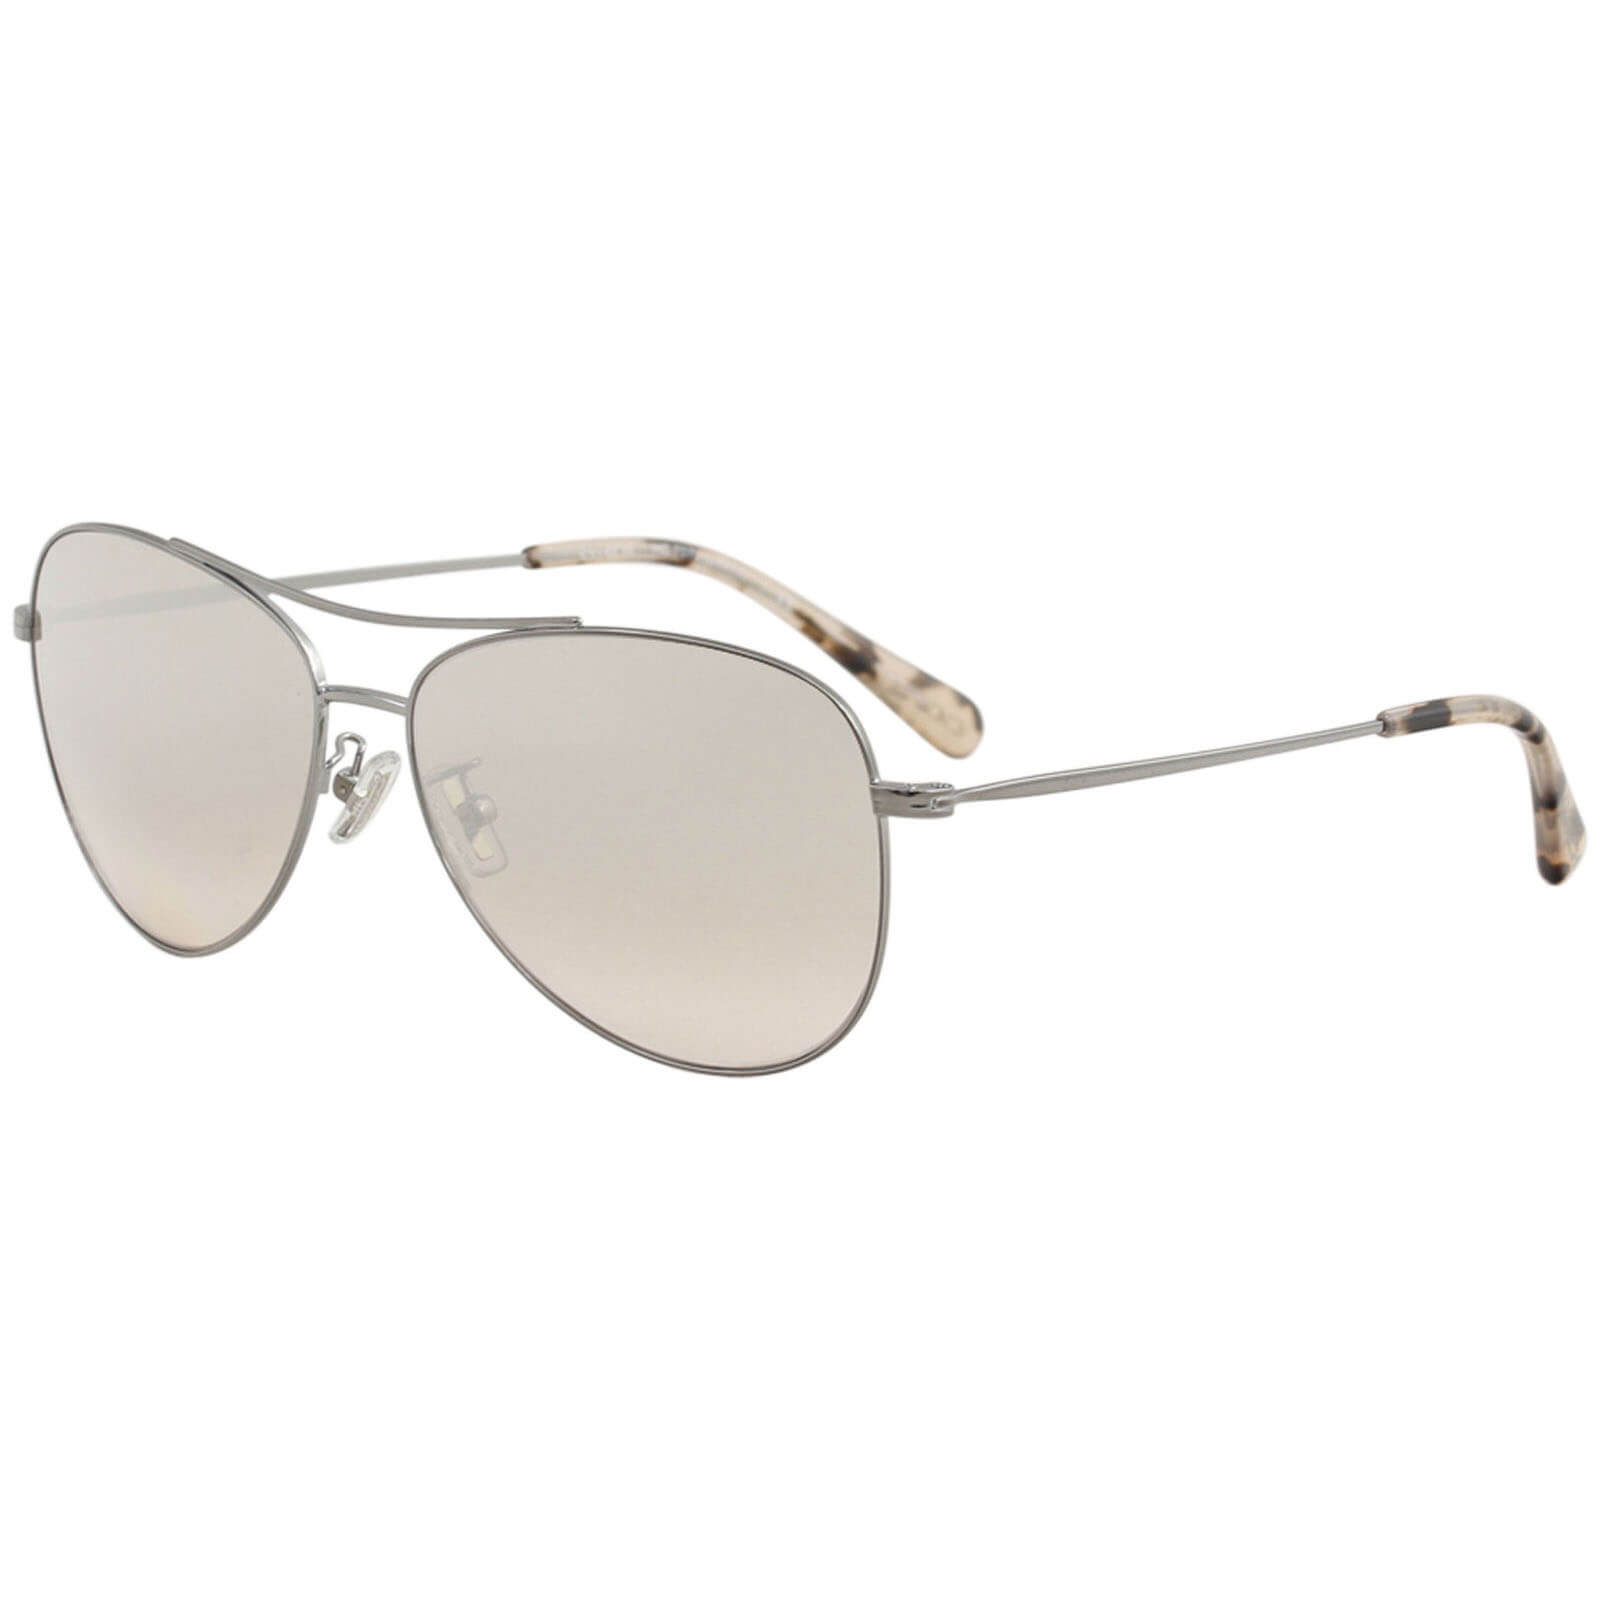 87390938fc755 Coach Women s HC7079 7079 93318Z Gunmetal Pilot Sunglasses